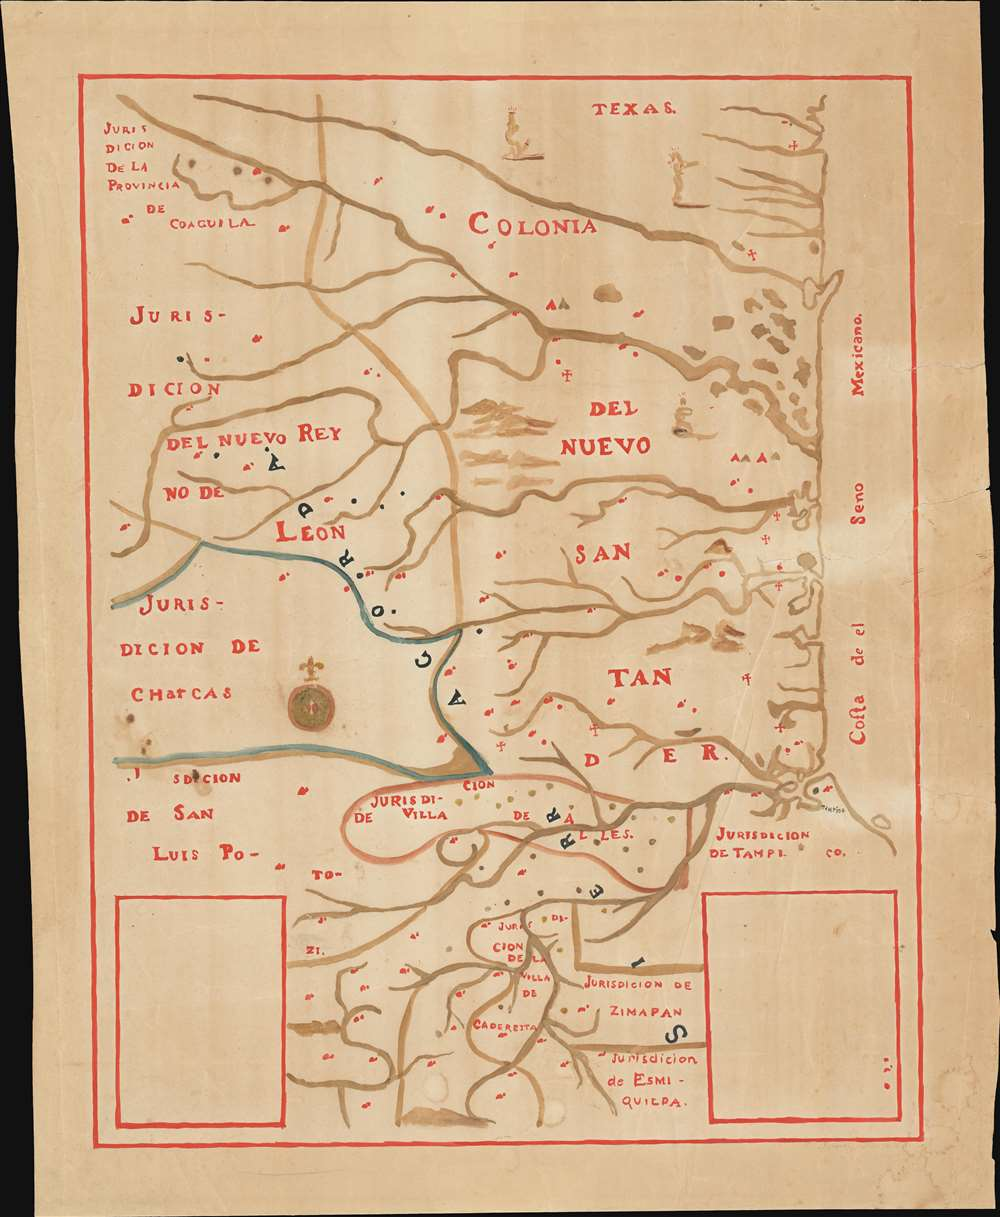 [Mapa de la Sierra Gorda] - Main View